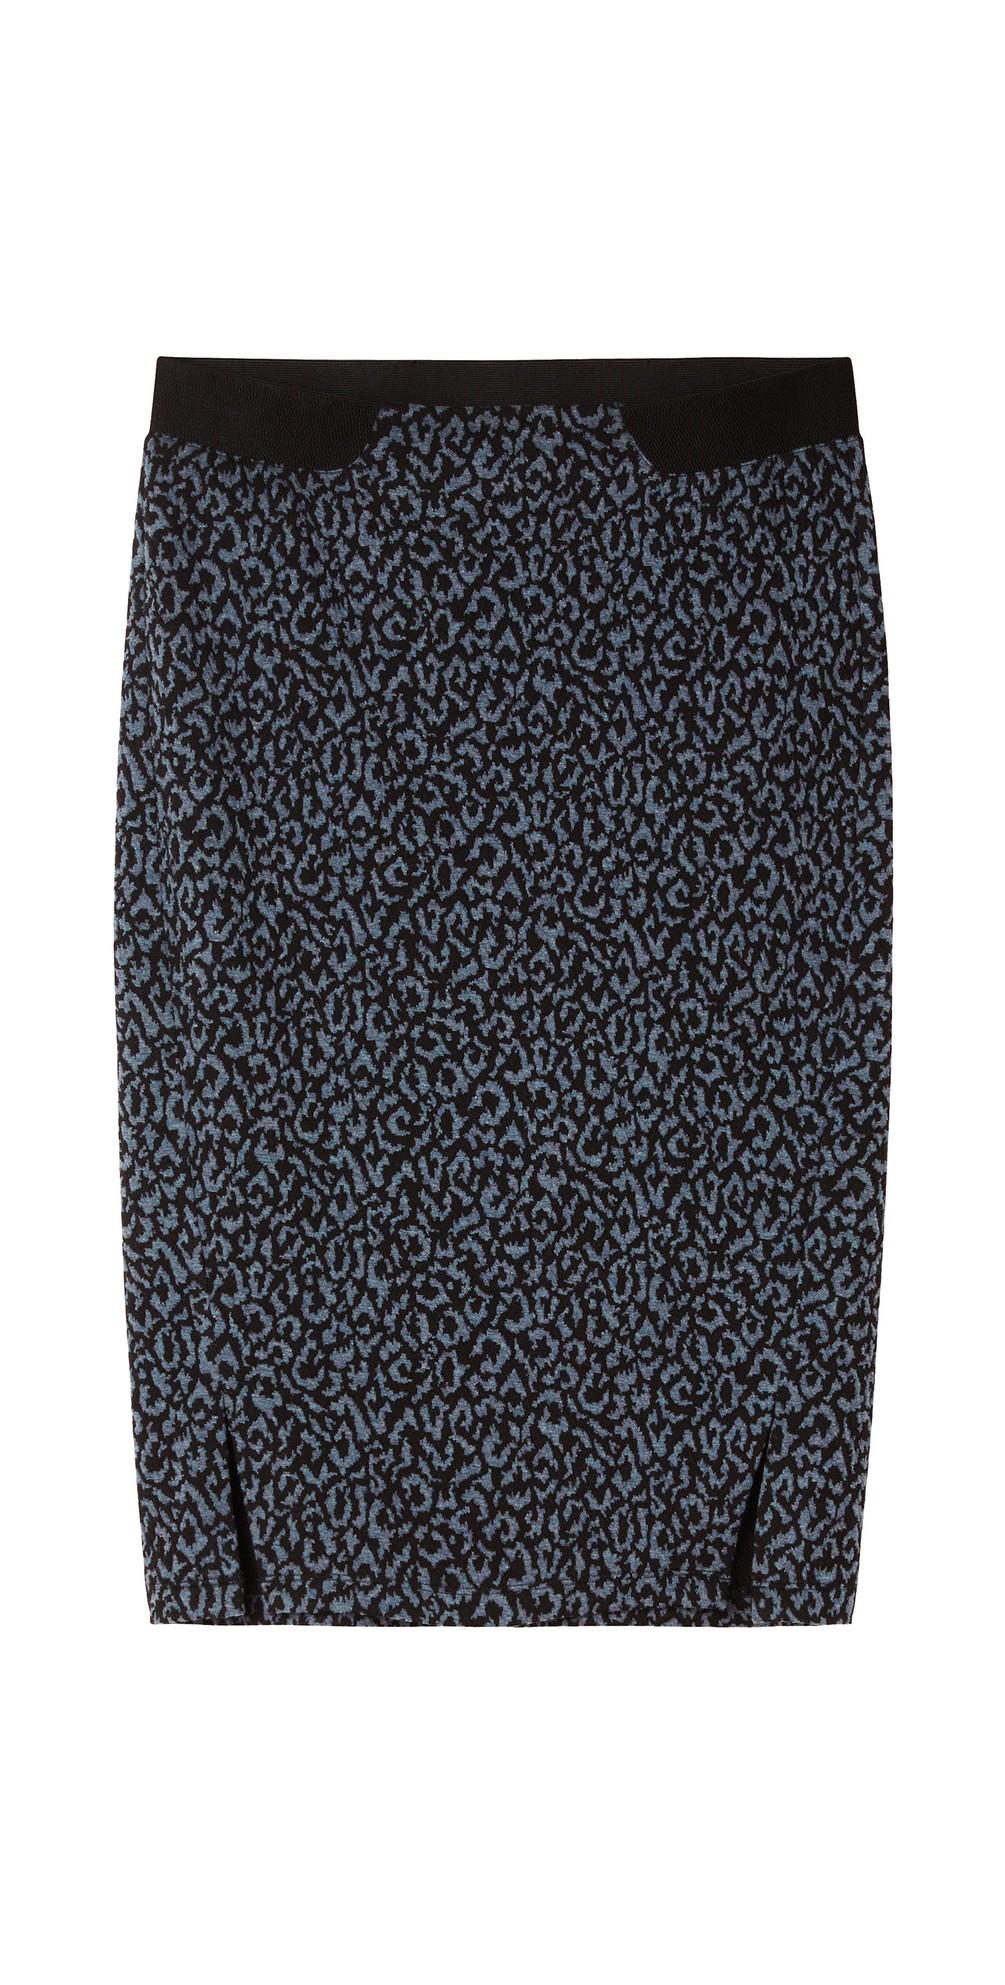 Leopard Jacquard Skirt main image